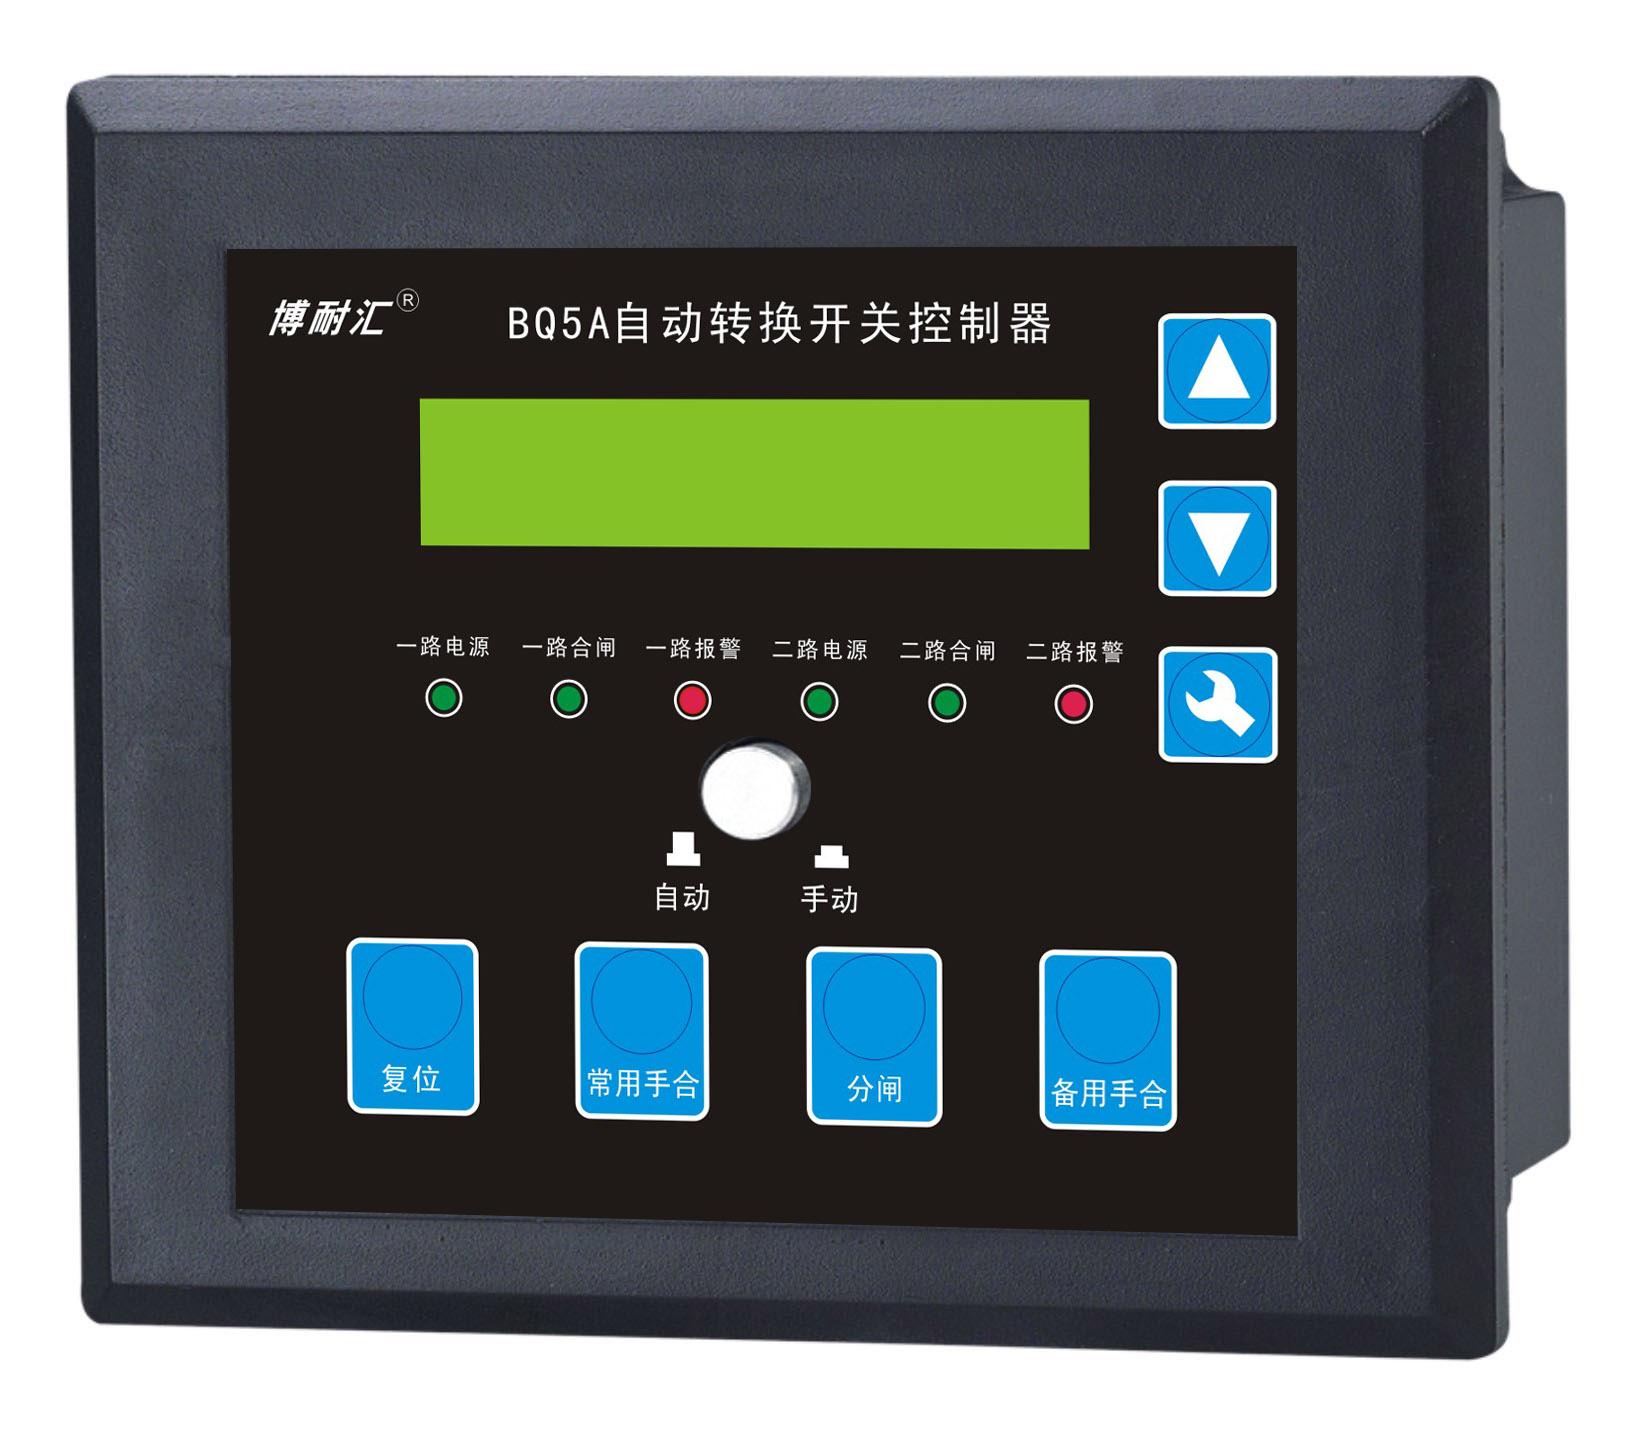 BQ5A液晶框架式雙電源控制器 萬能斷路器雙電源